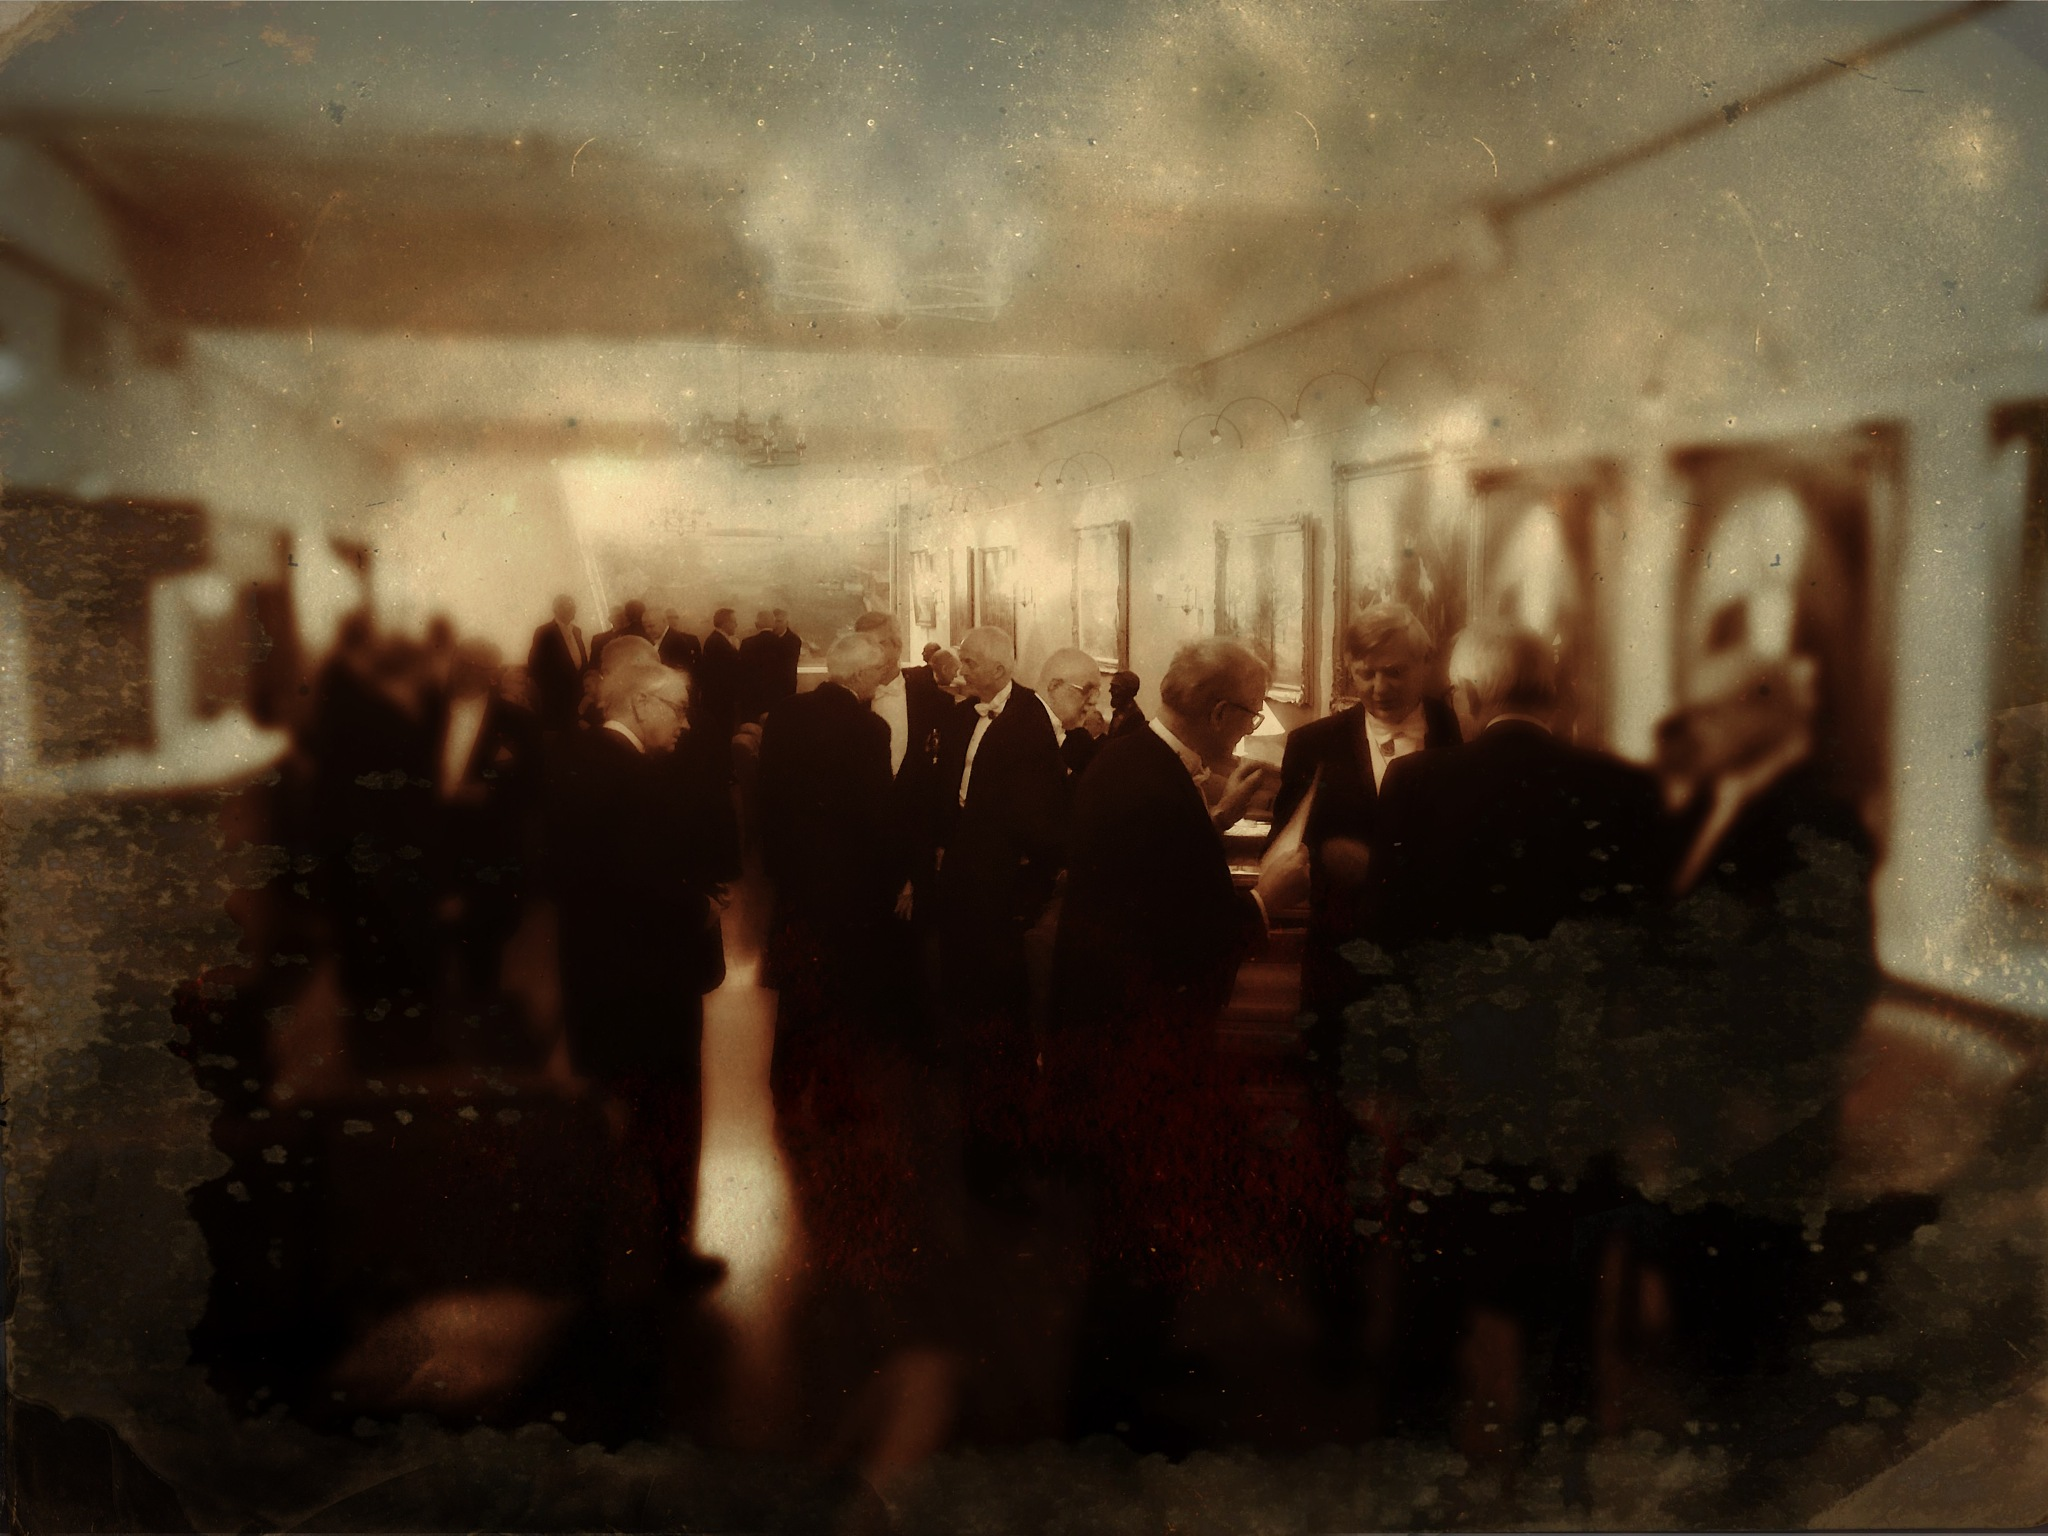 Inside The Brotherhood by Goran Jorganovich